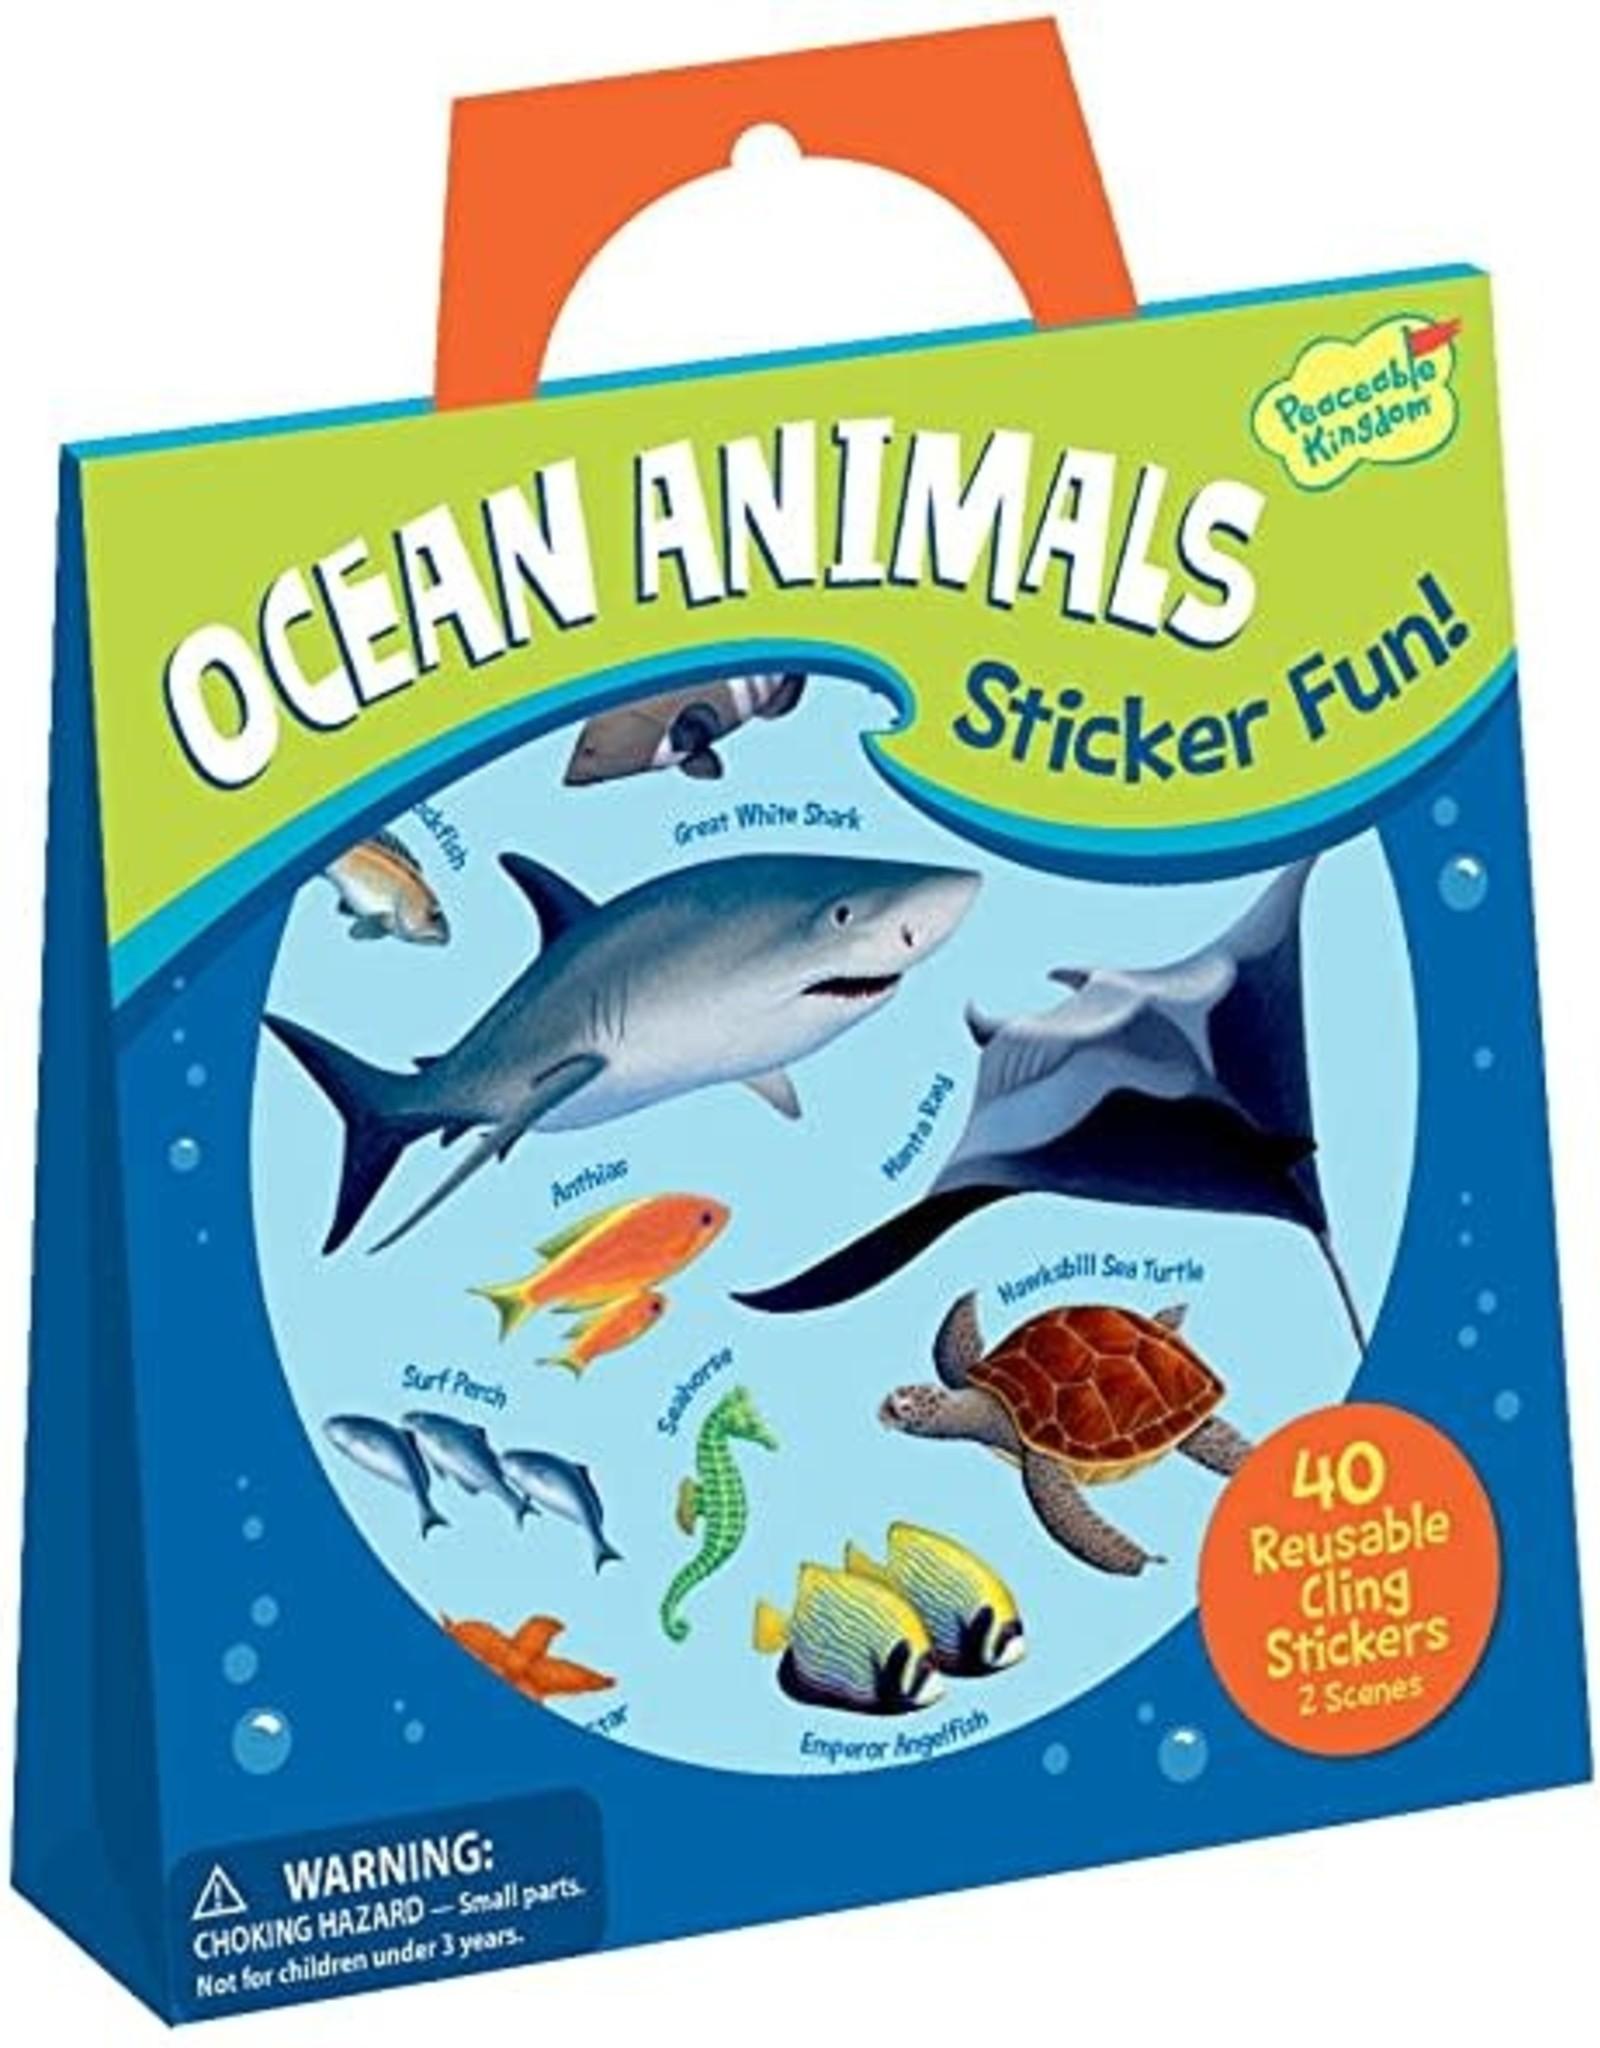 Peaceable Kingdom Reusable Sticker Tote - Ocean Animals